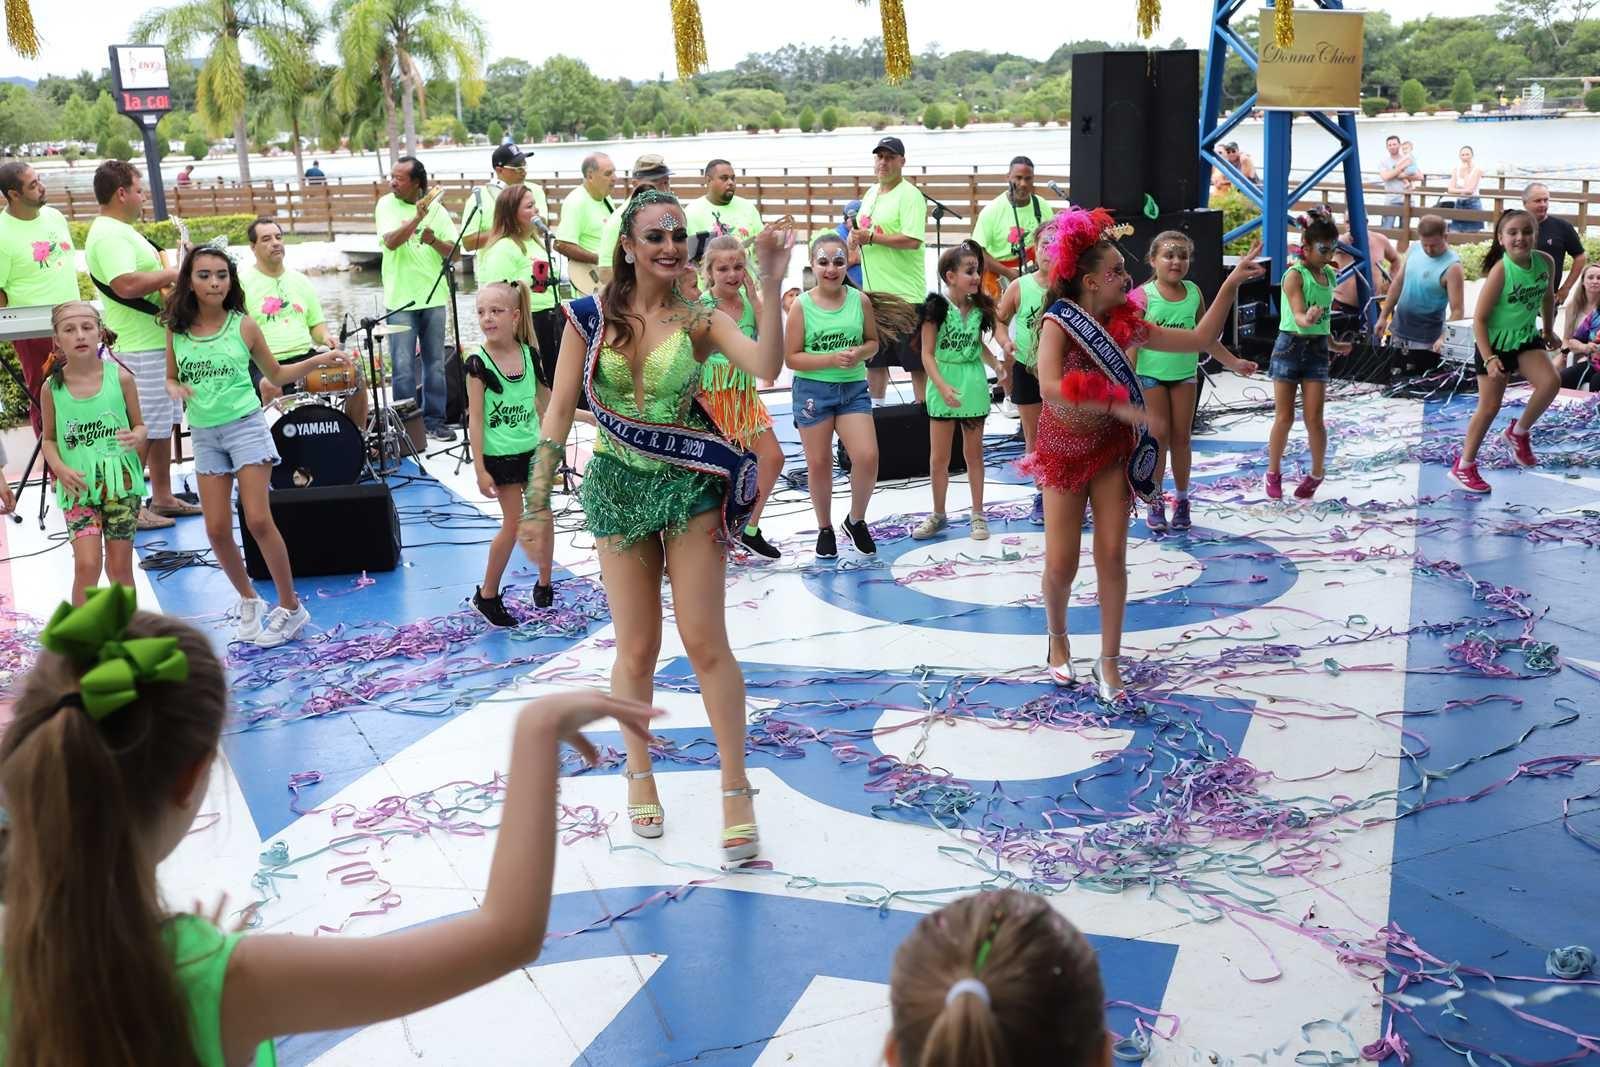 Grito do Carnaval 2020